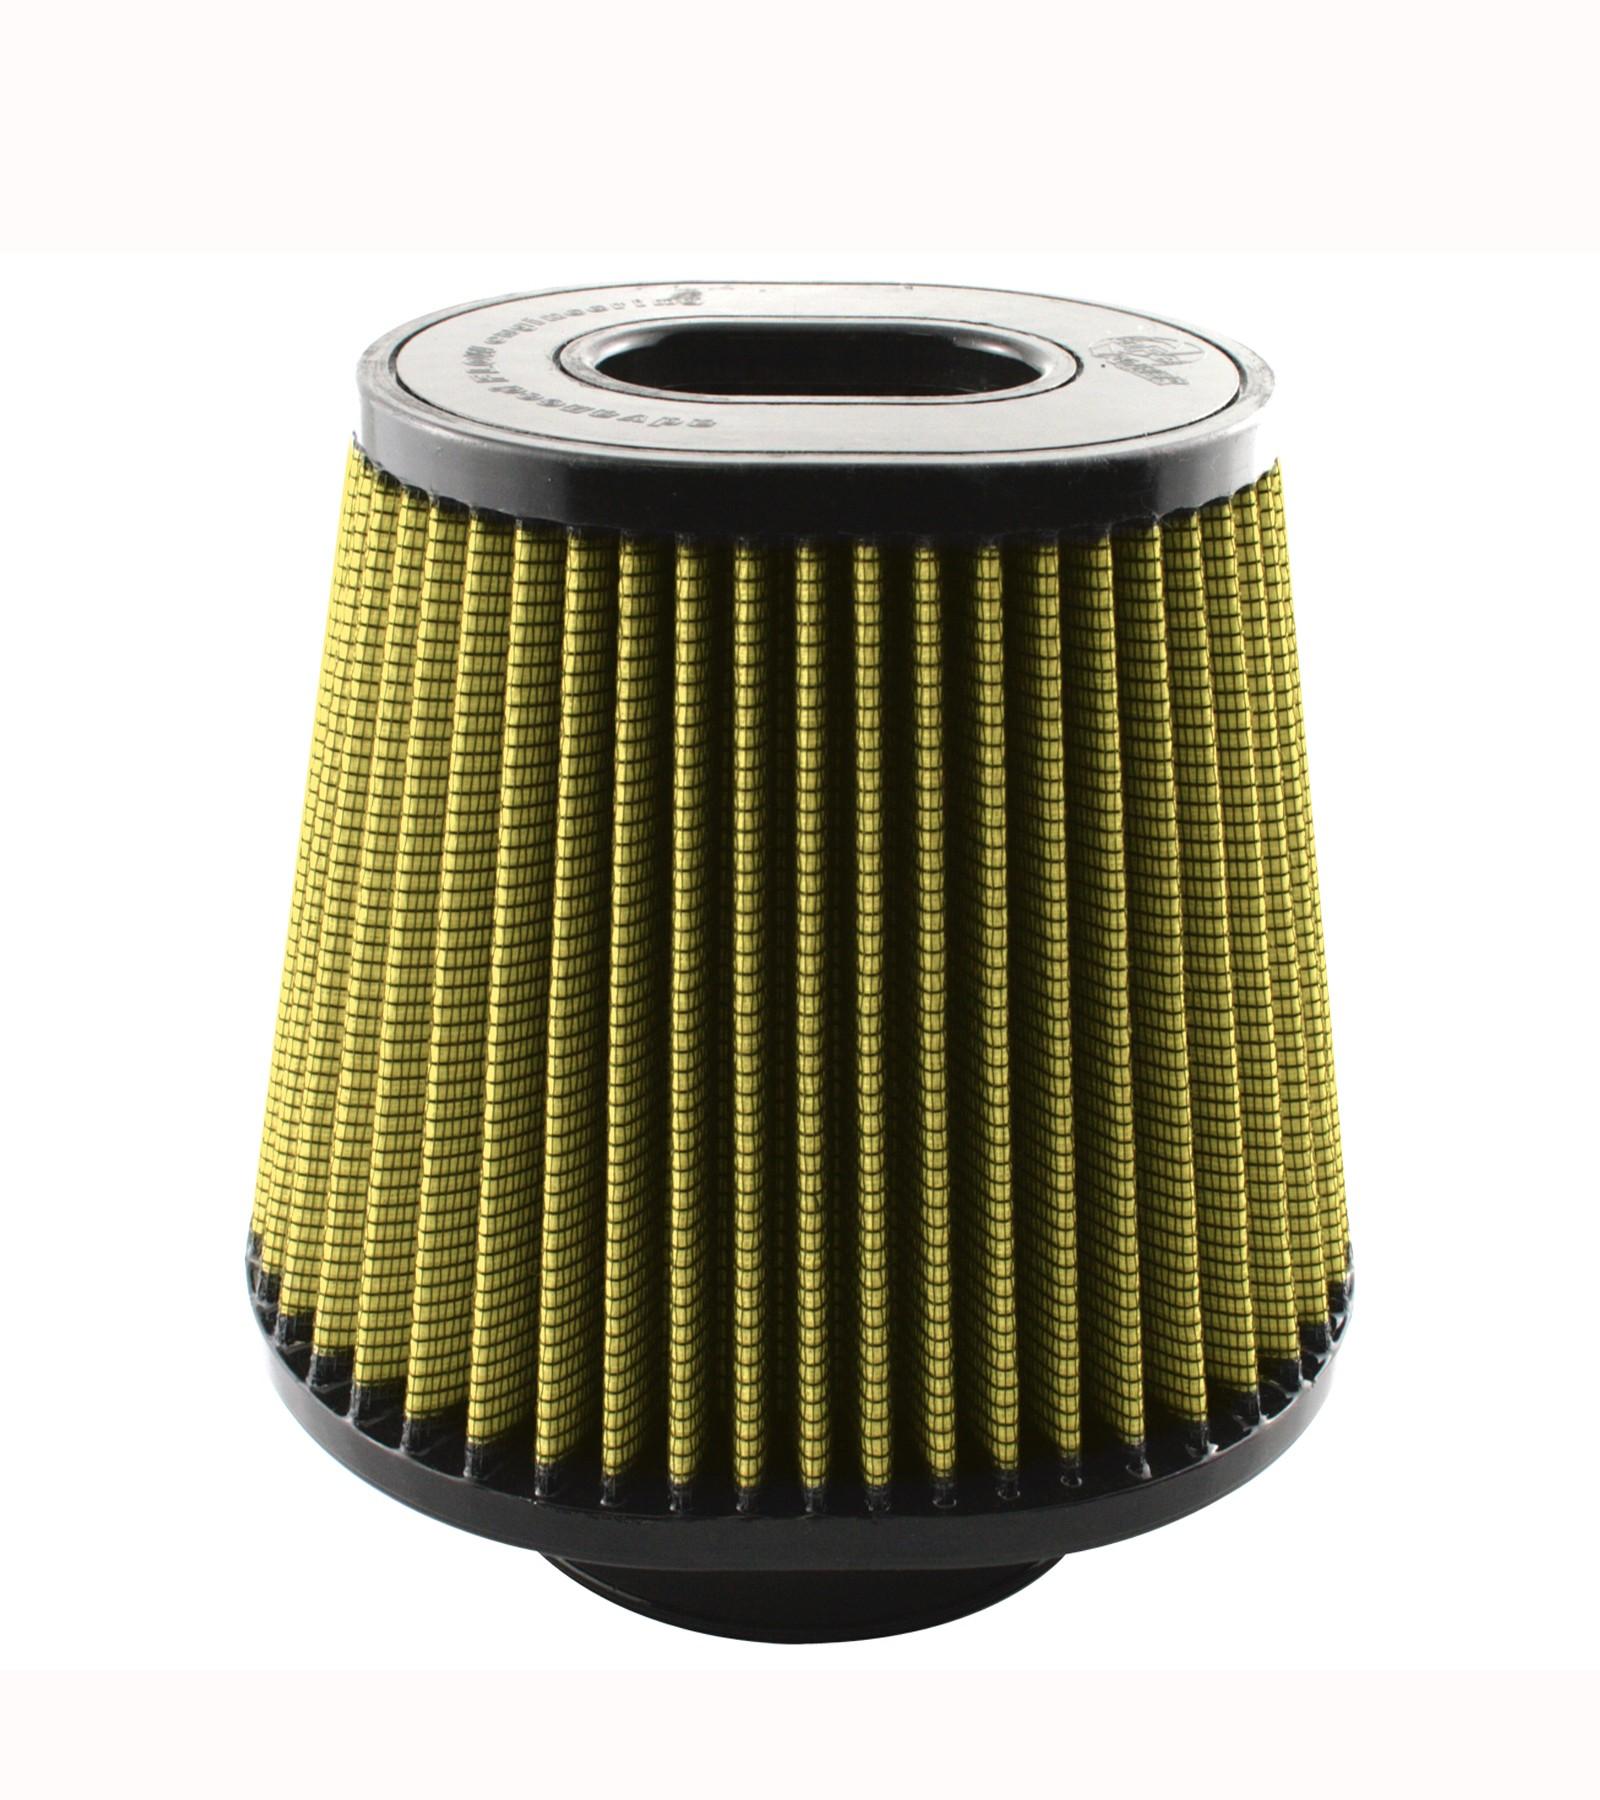 aFe POWER 72-91044 Magnum FLOW Pro GUARD7 Air Filter